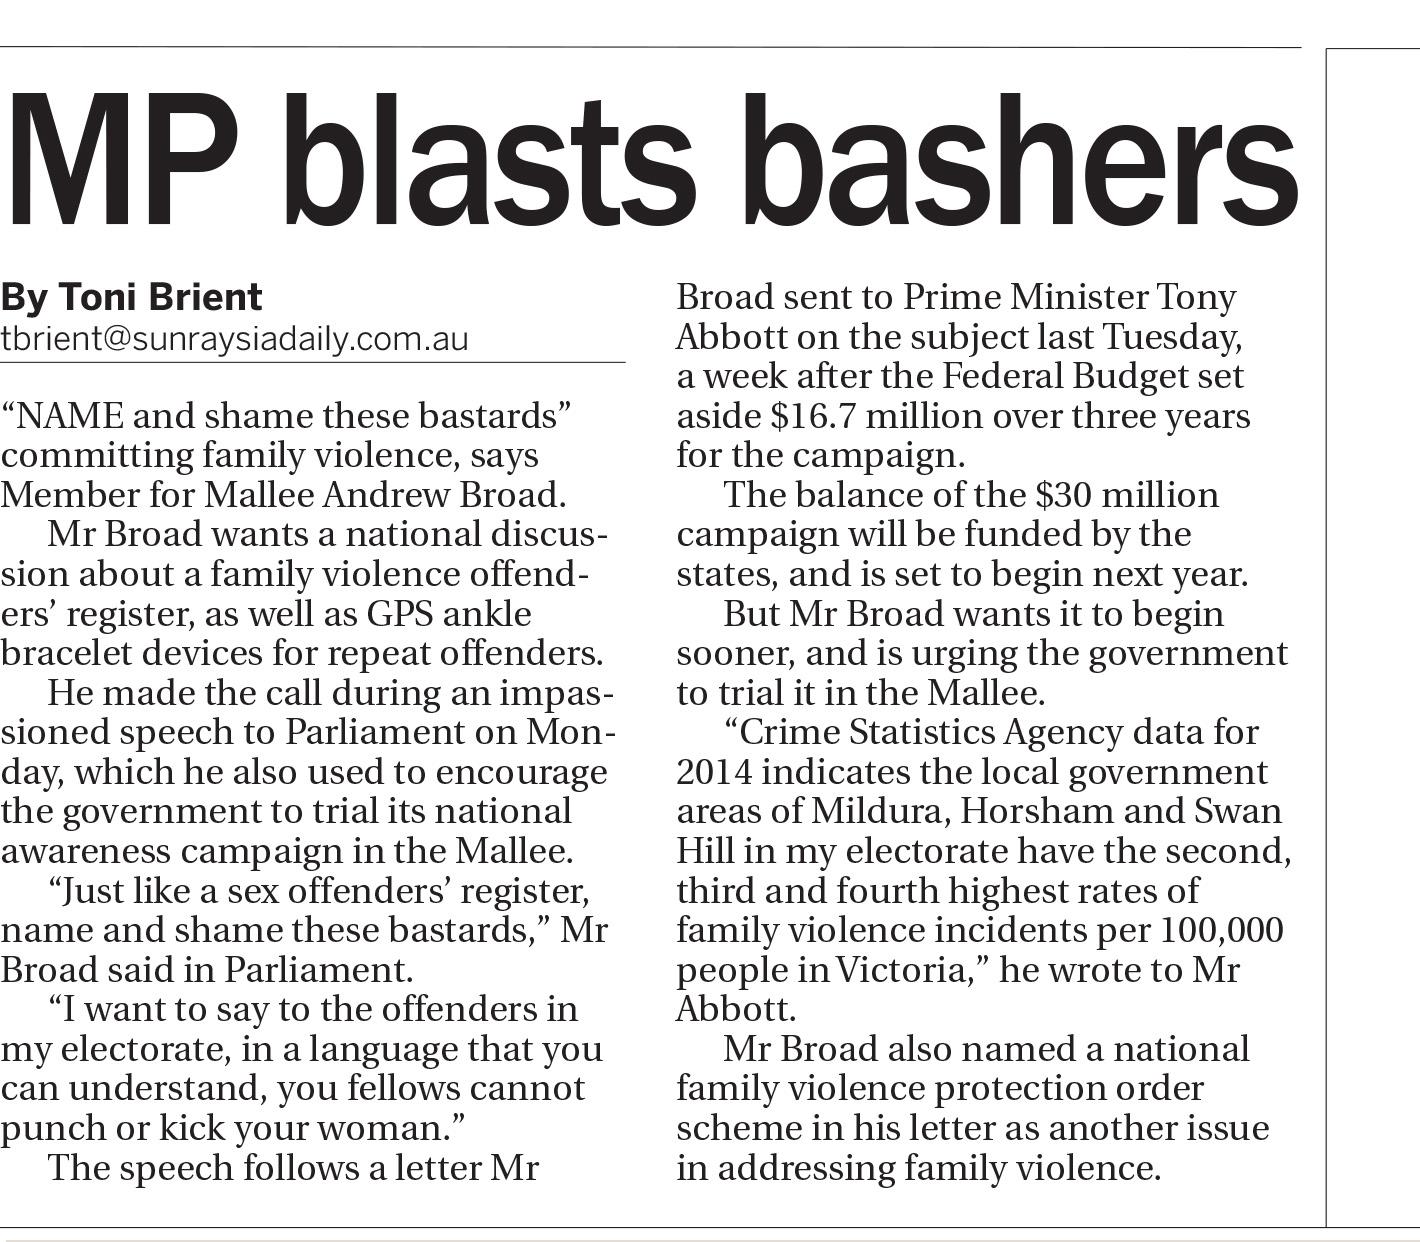 MP blasts bashers , Sunraysia Daily, May 27, 2015.